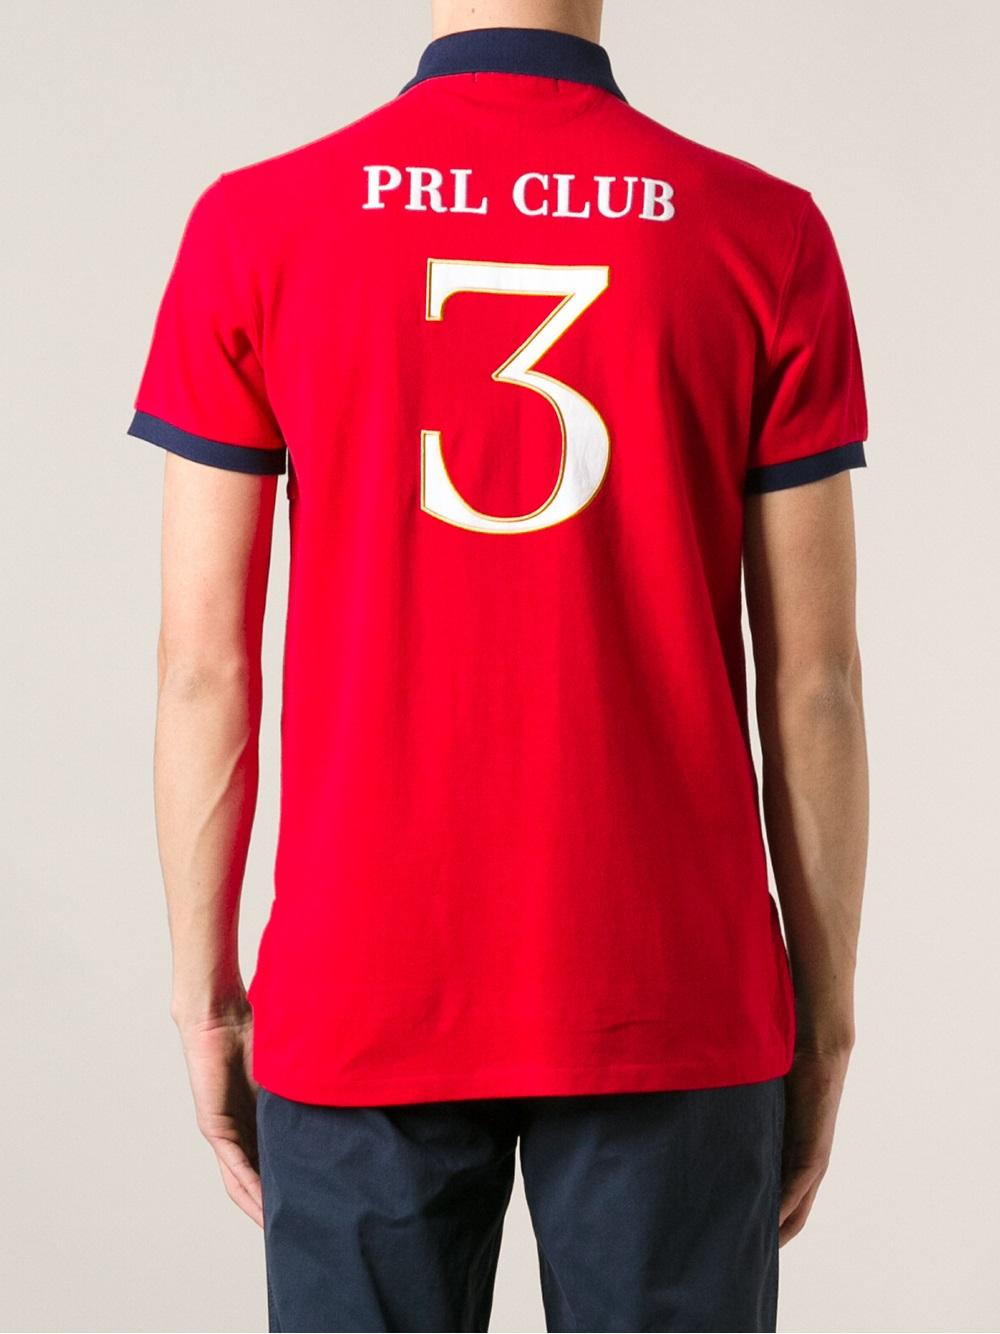 Lyst polo ralph lauren prl club polo shirt in red for men for Ralph lauren polo club shirts